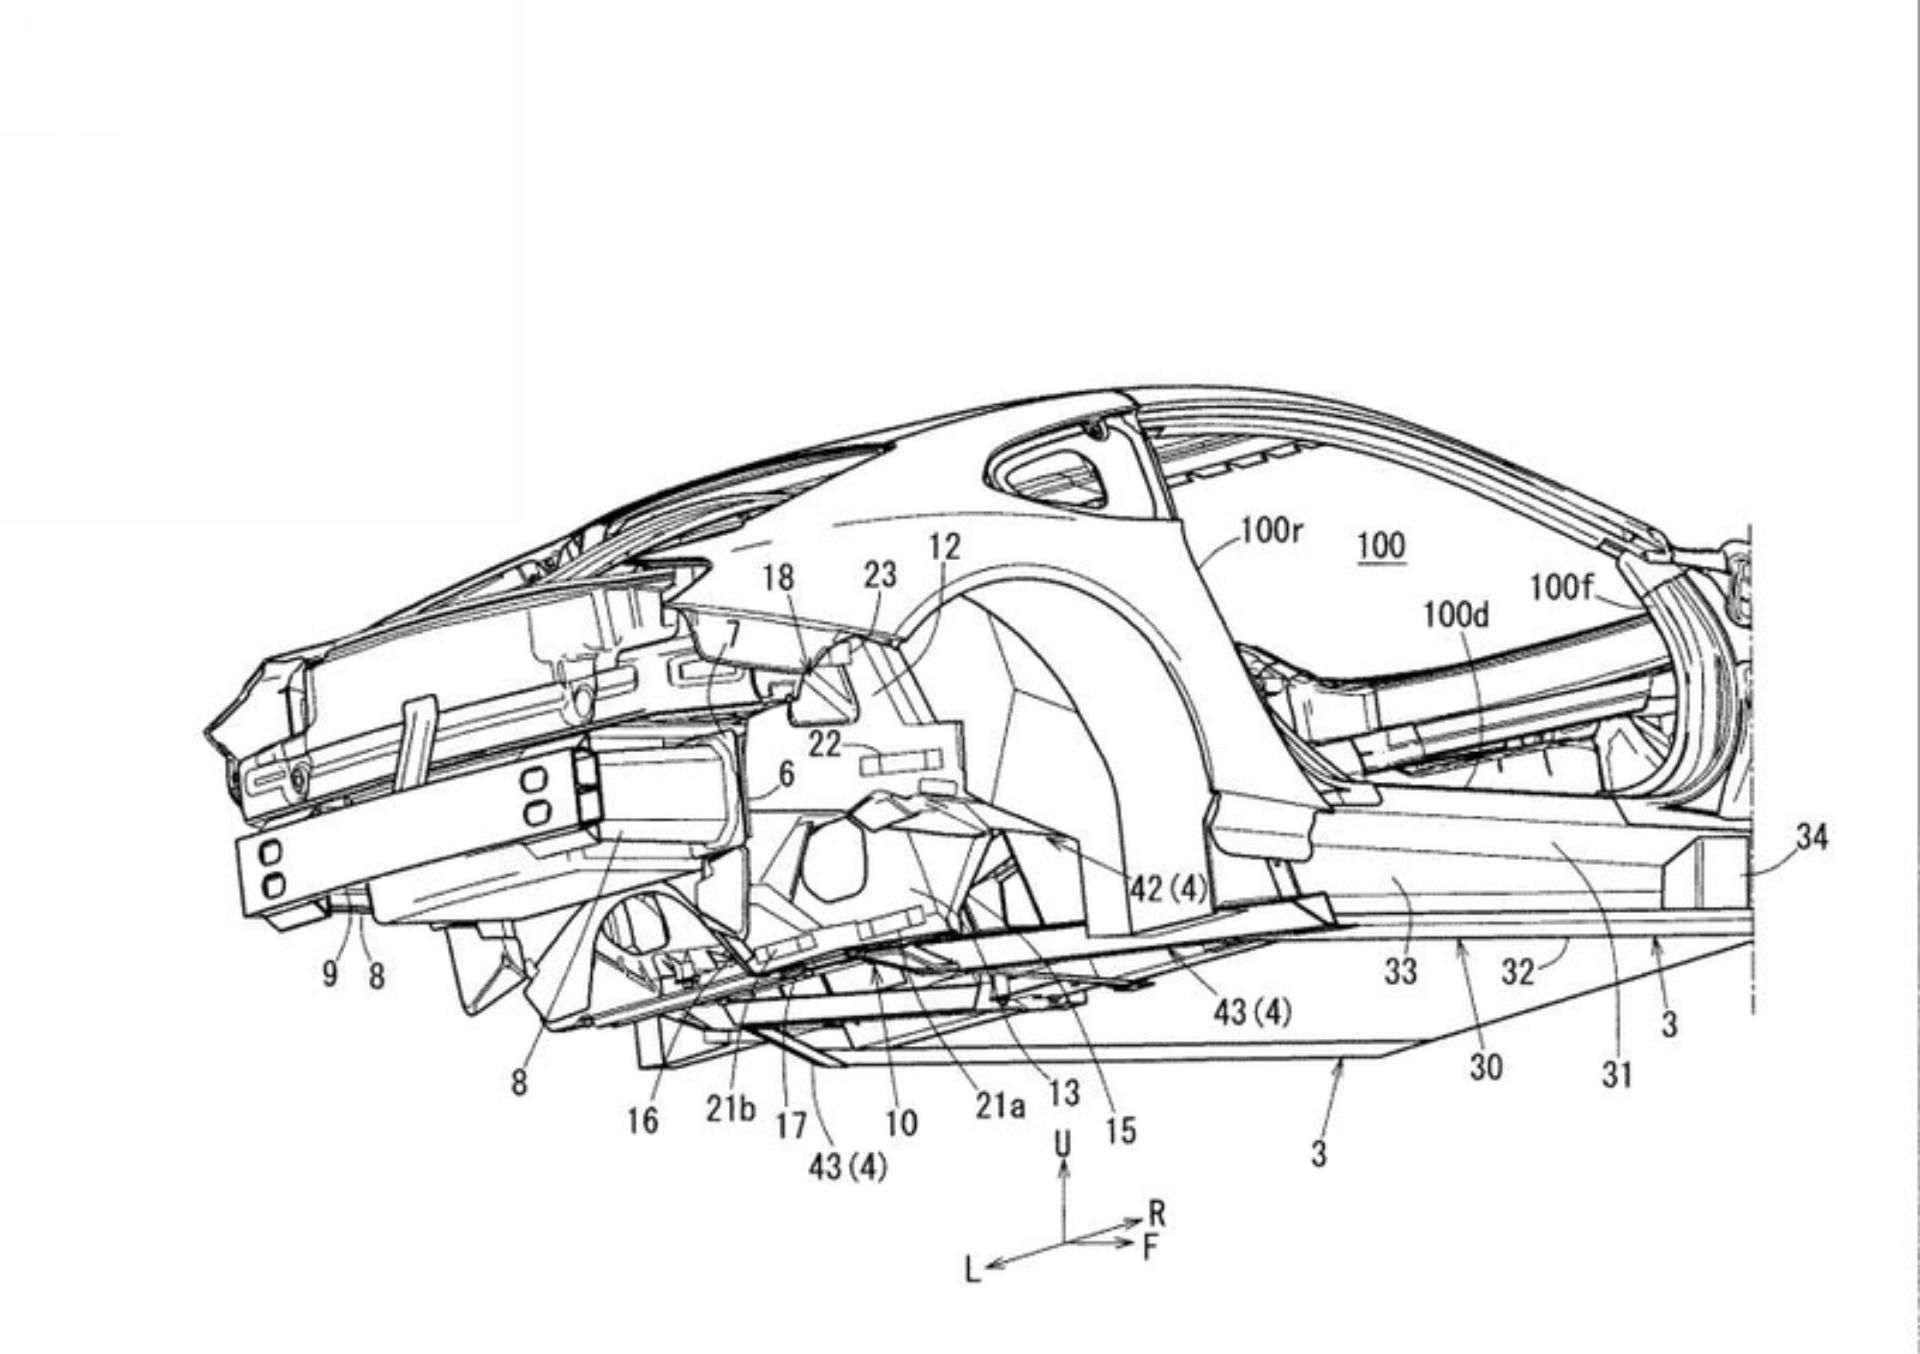 Mazda-Structure-patent-filing-1